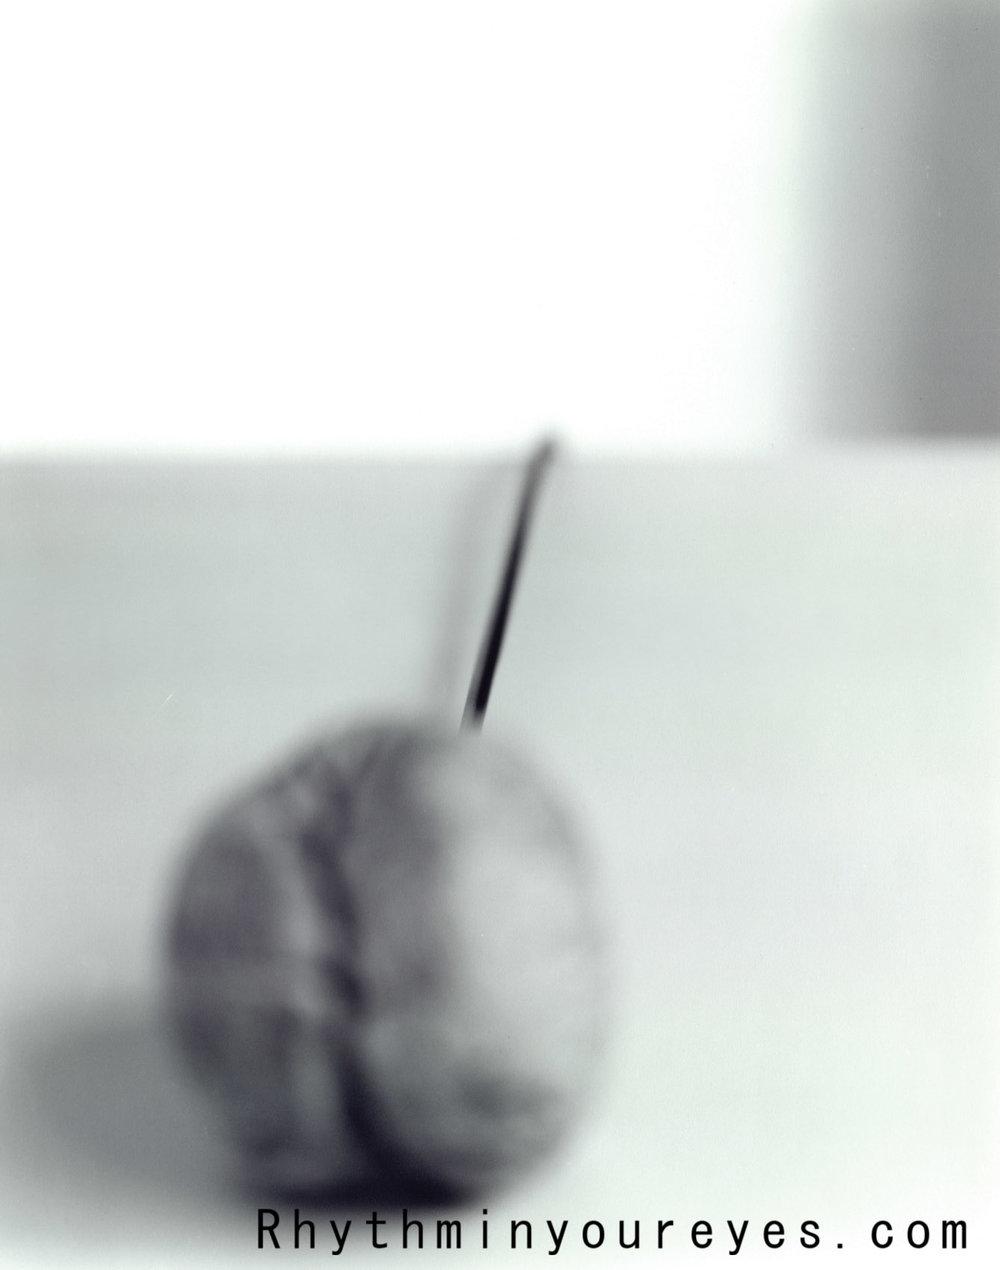 film-010.jpg